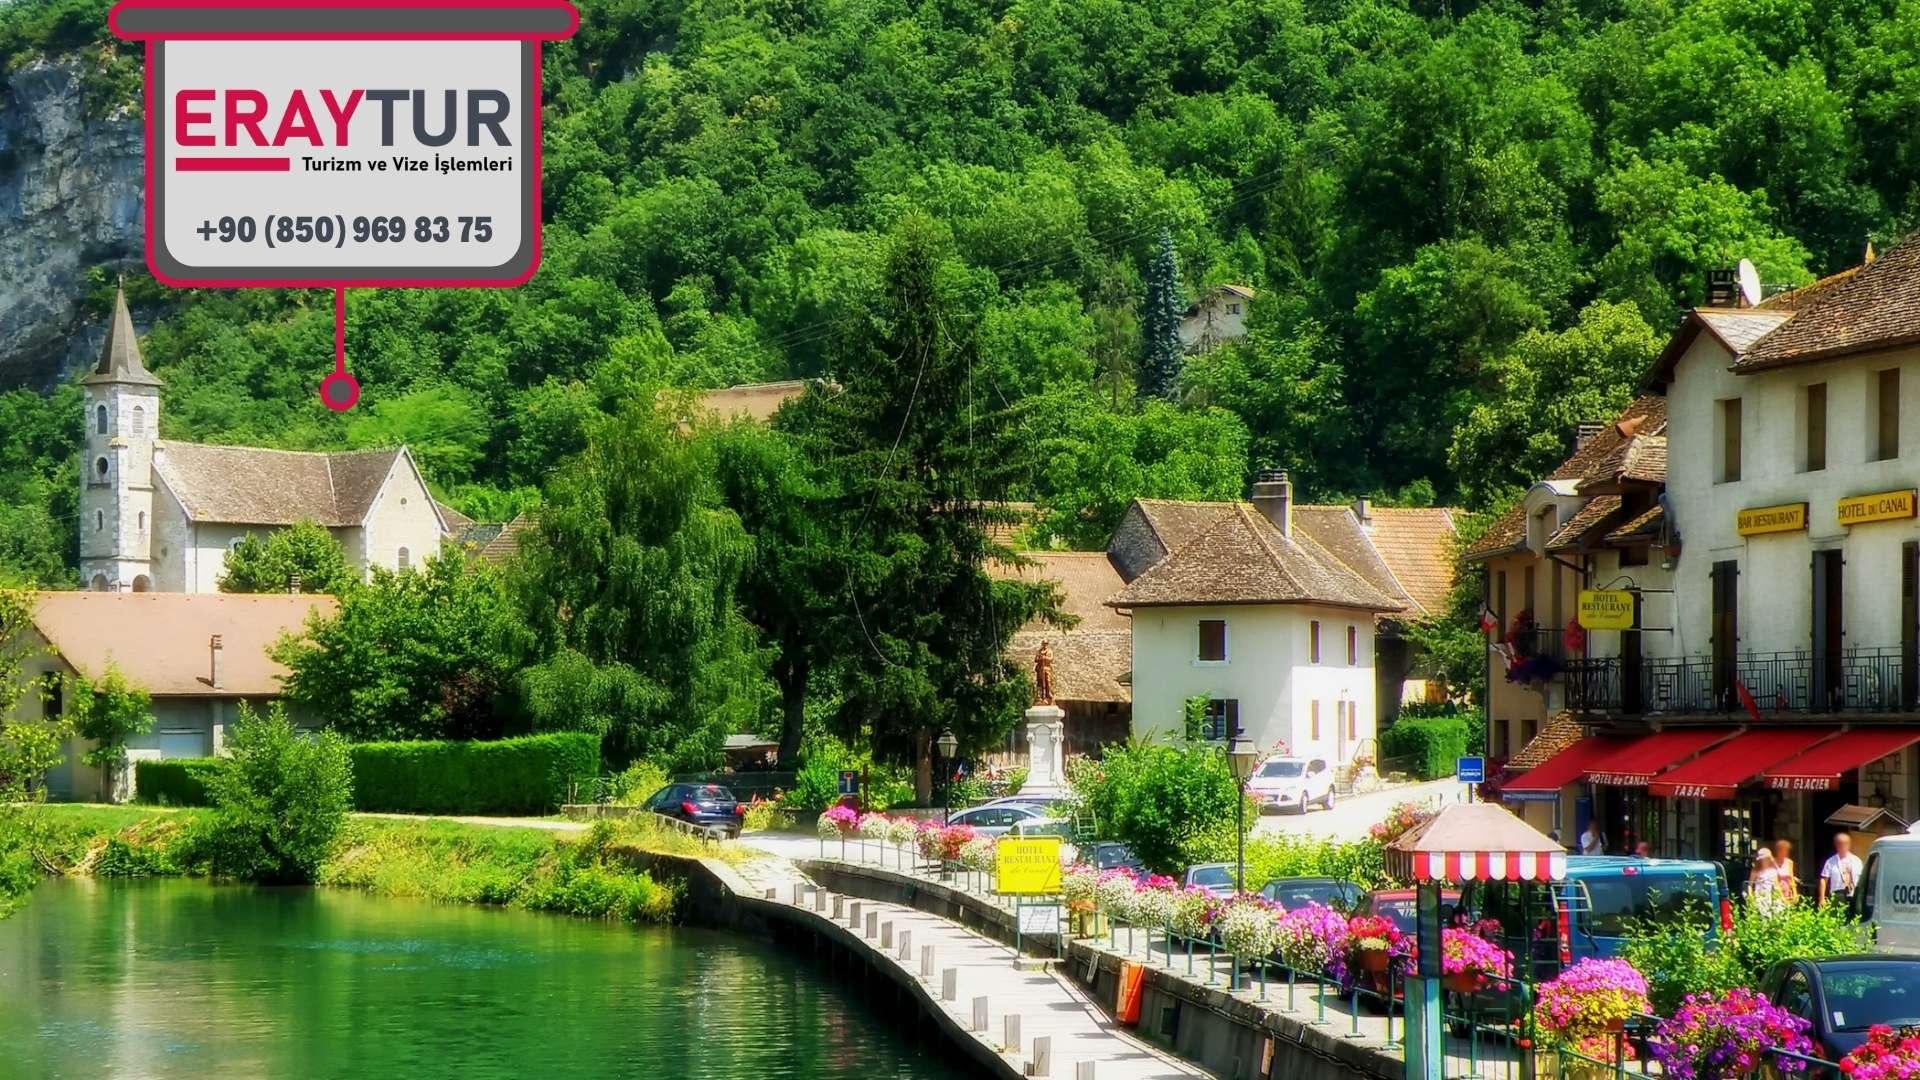 Fransa Turistik Vize Formu